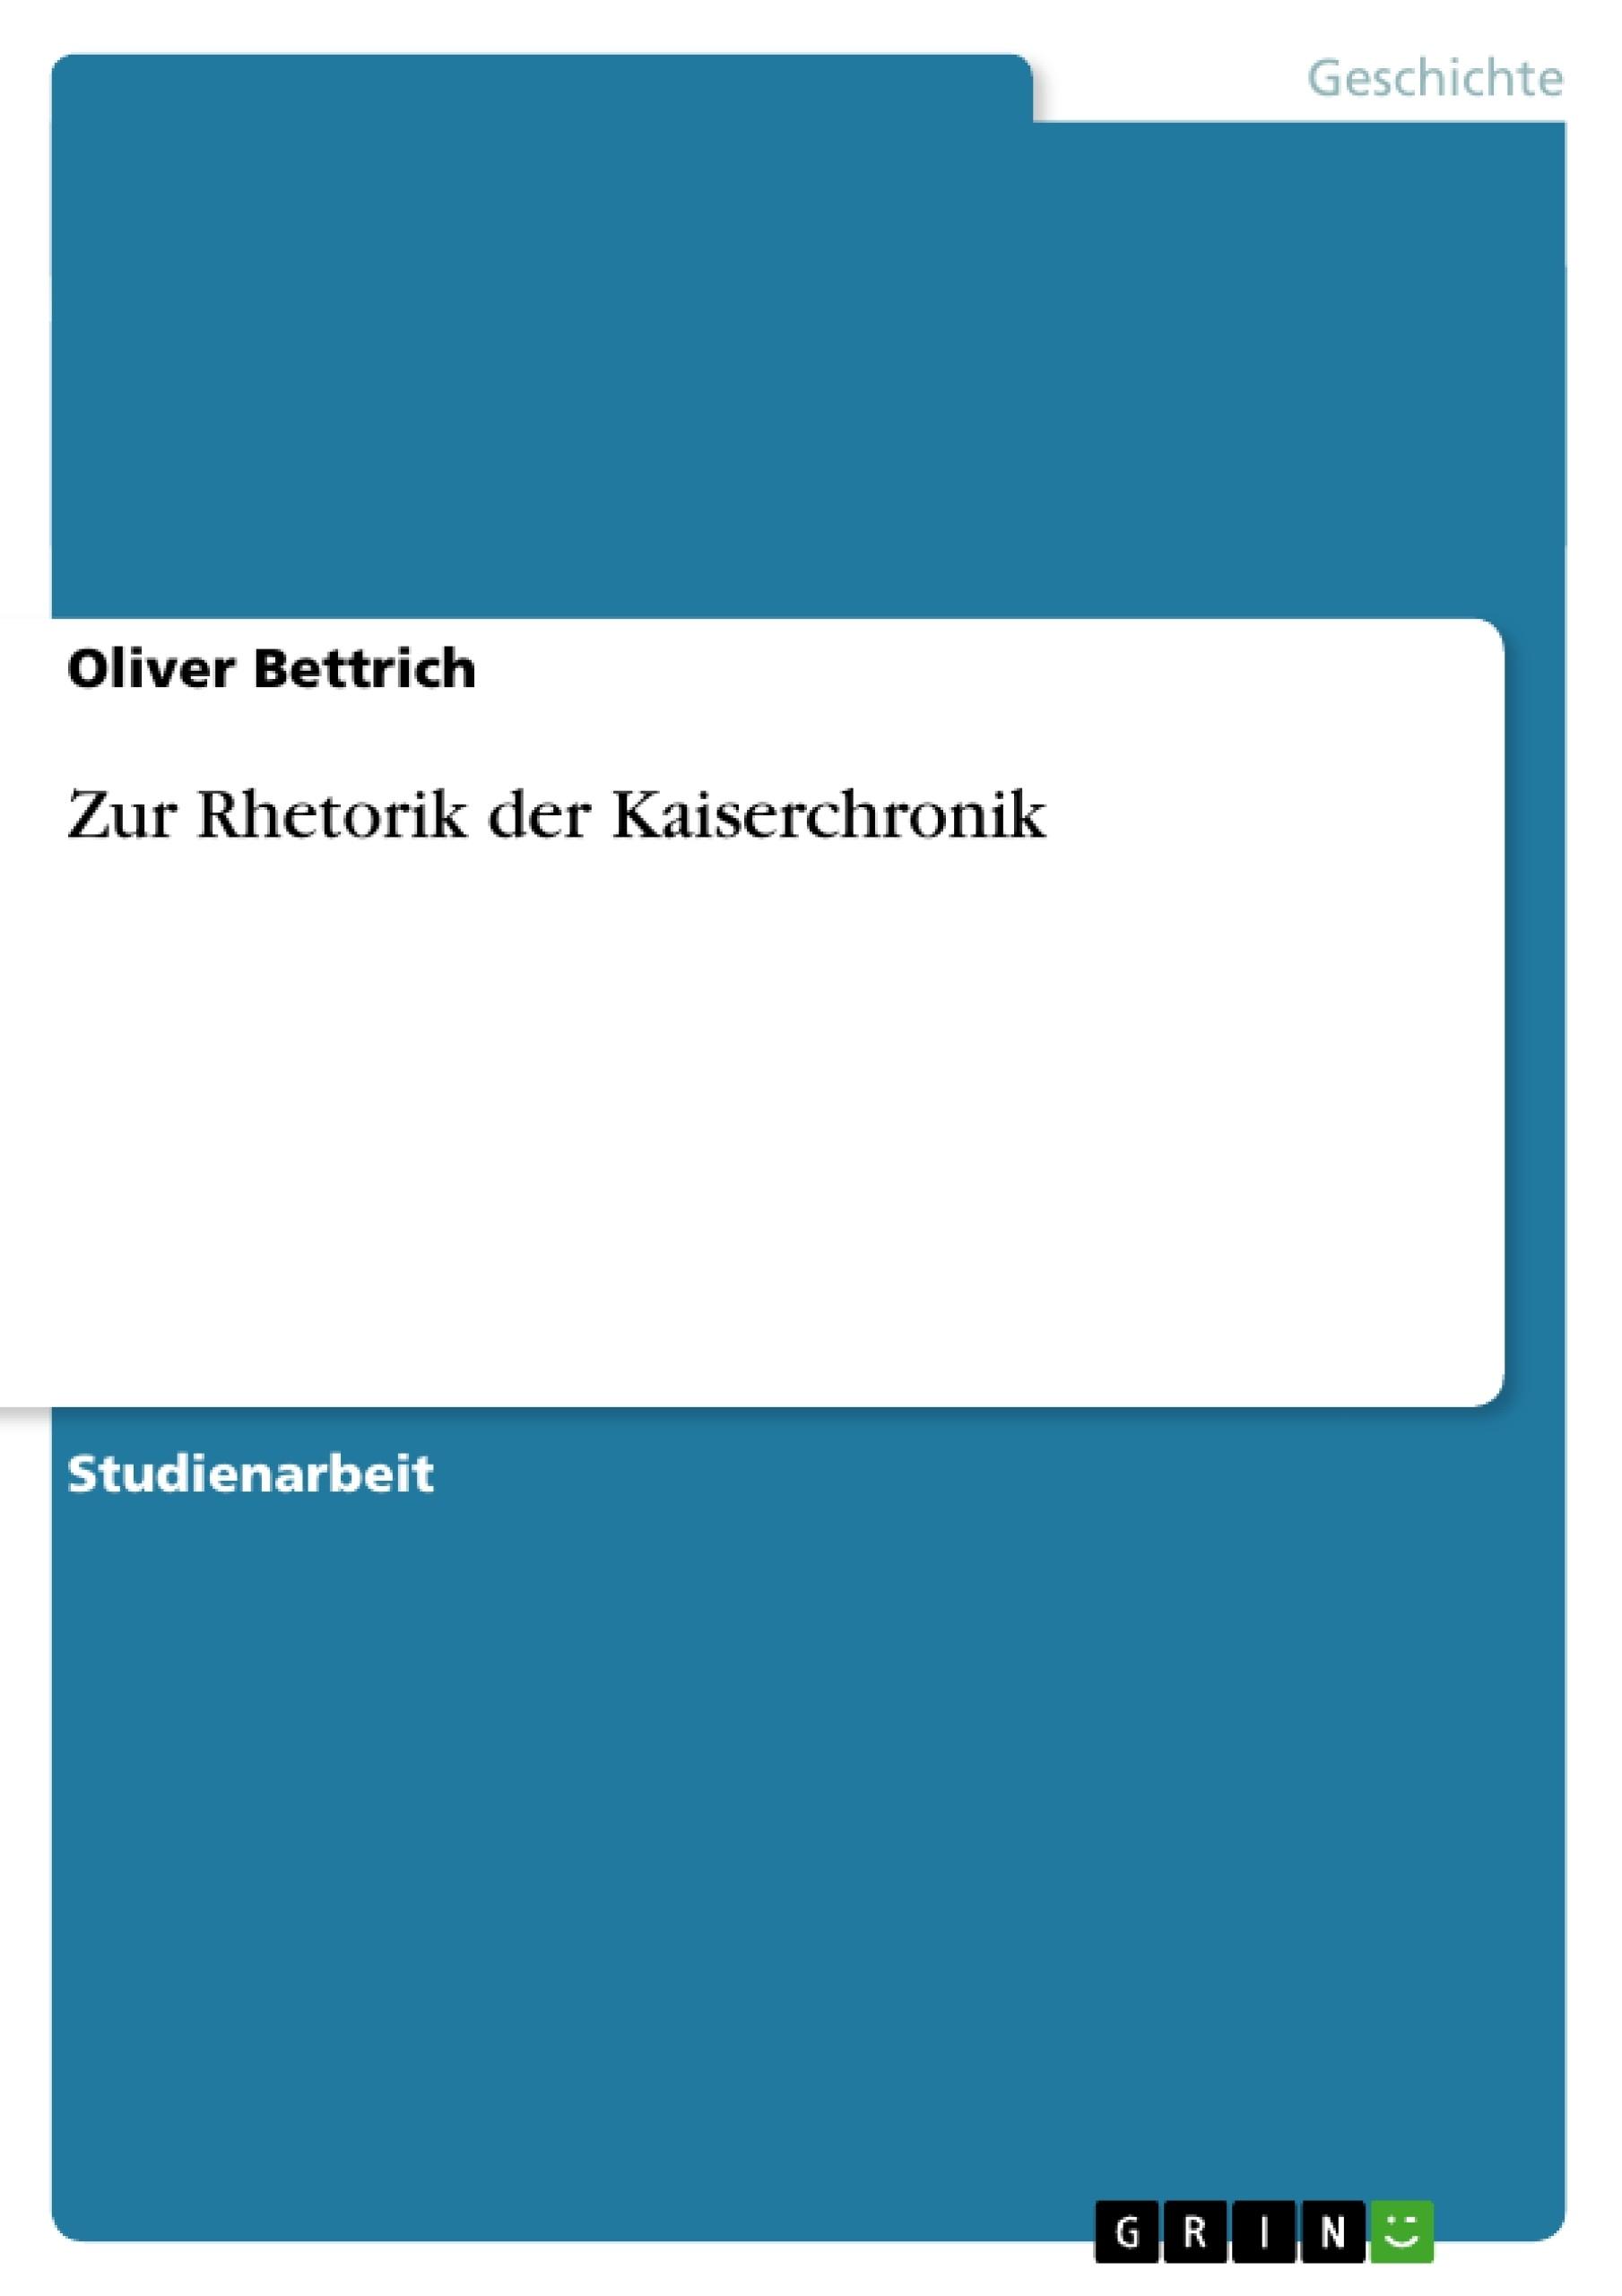 Titel: Zur Rhetorik der Kaiserchronik